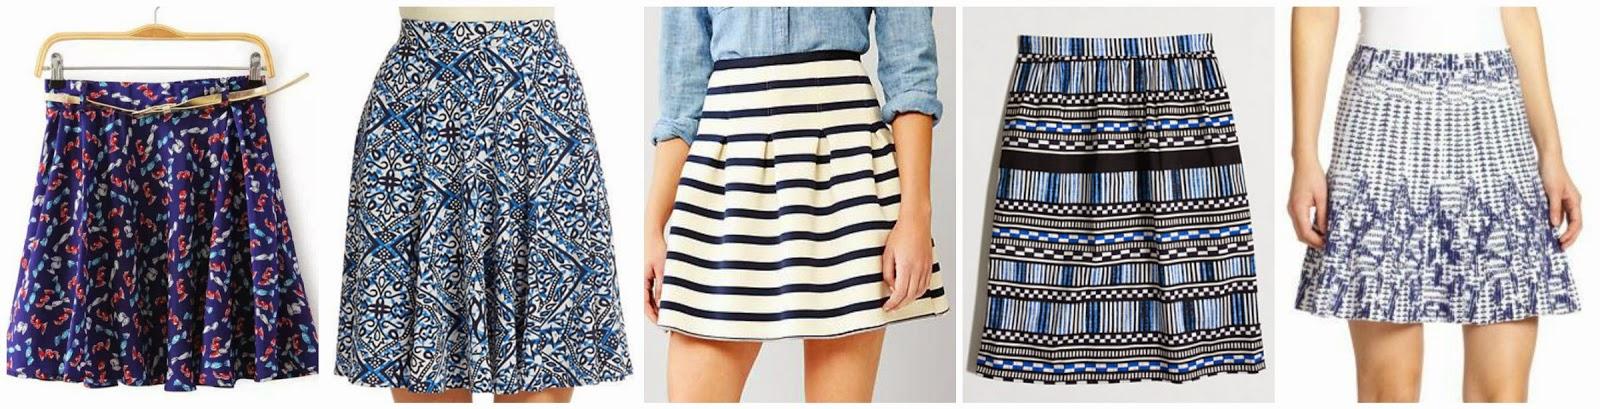 Romwe Blue Candy Print Pleated Skirt $9.99 (regular $14.99)  Context Batik Print Skater Skirt $18.02 (regular $68.00)  Gap Stripe Flared Skirt $29.99 (regular $54.95)  J. Crew Factory Printed Stretch Cotton Skirt $52.50 (regular $85.00)  BCBGMAXAZRIA Peyton Printed Knit Skirt $91.20 (regular $228.00) alternate link